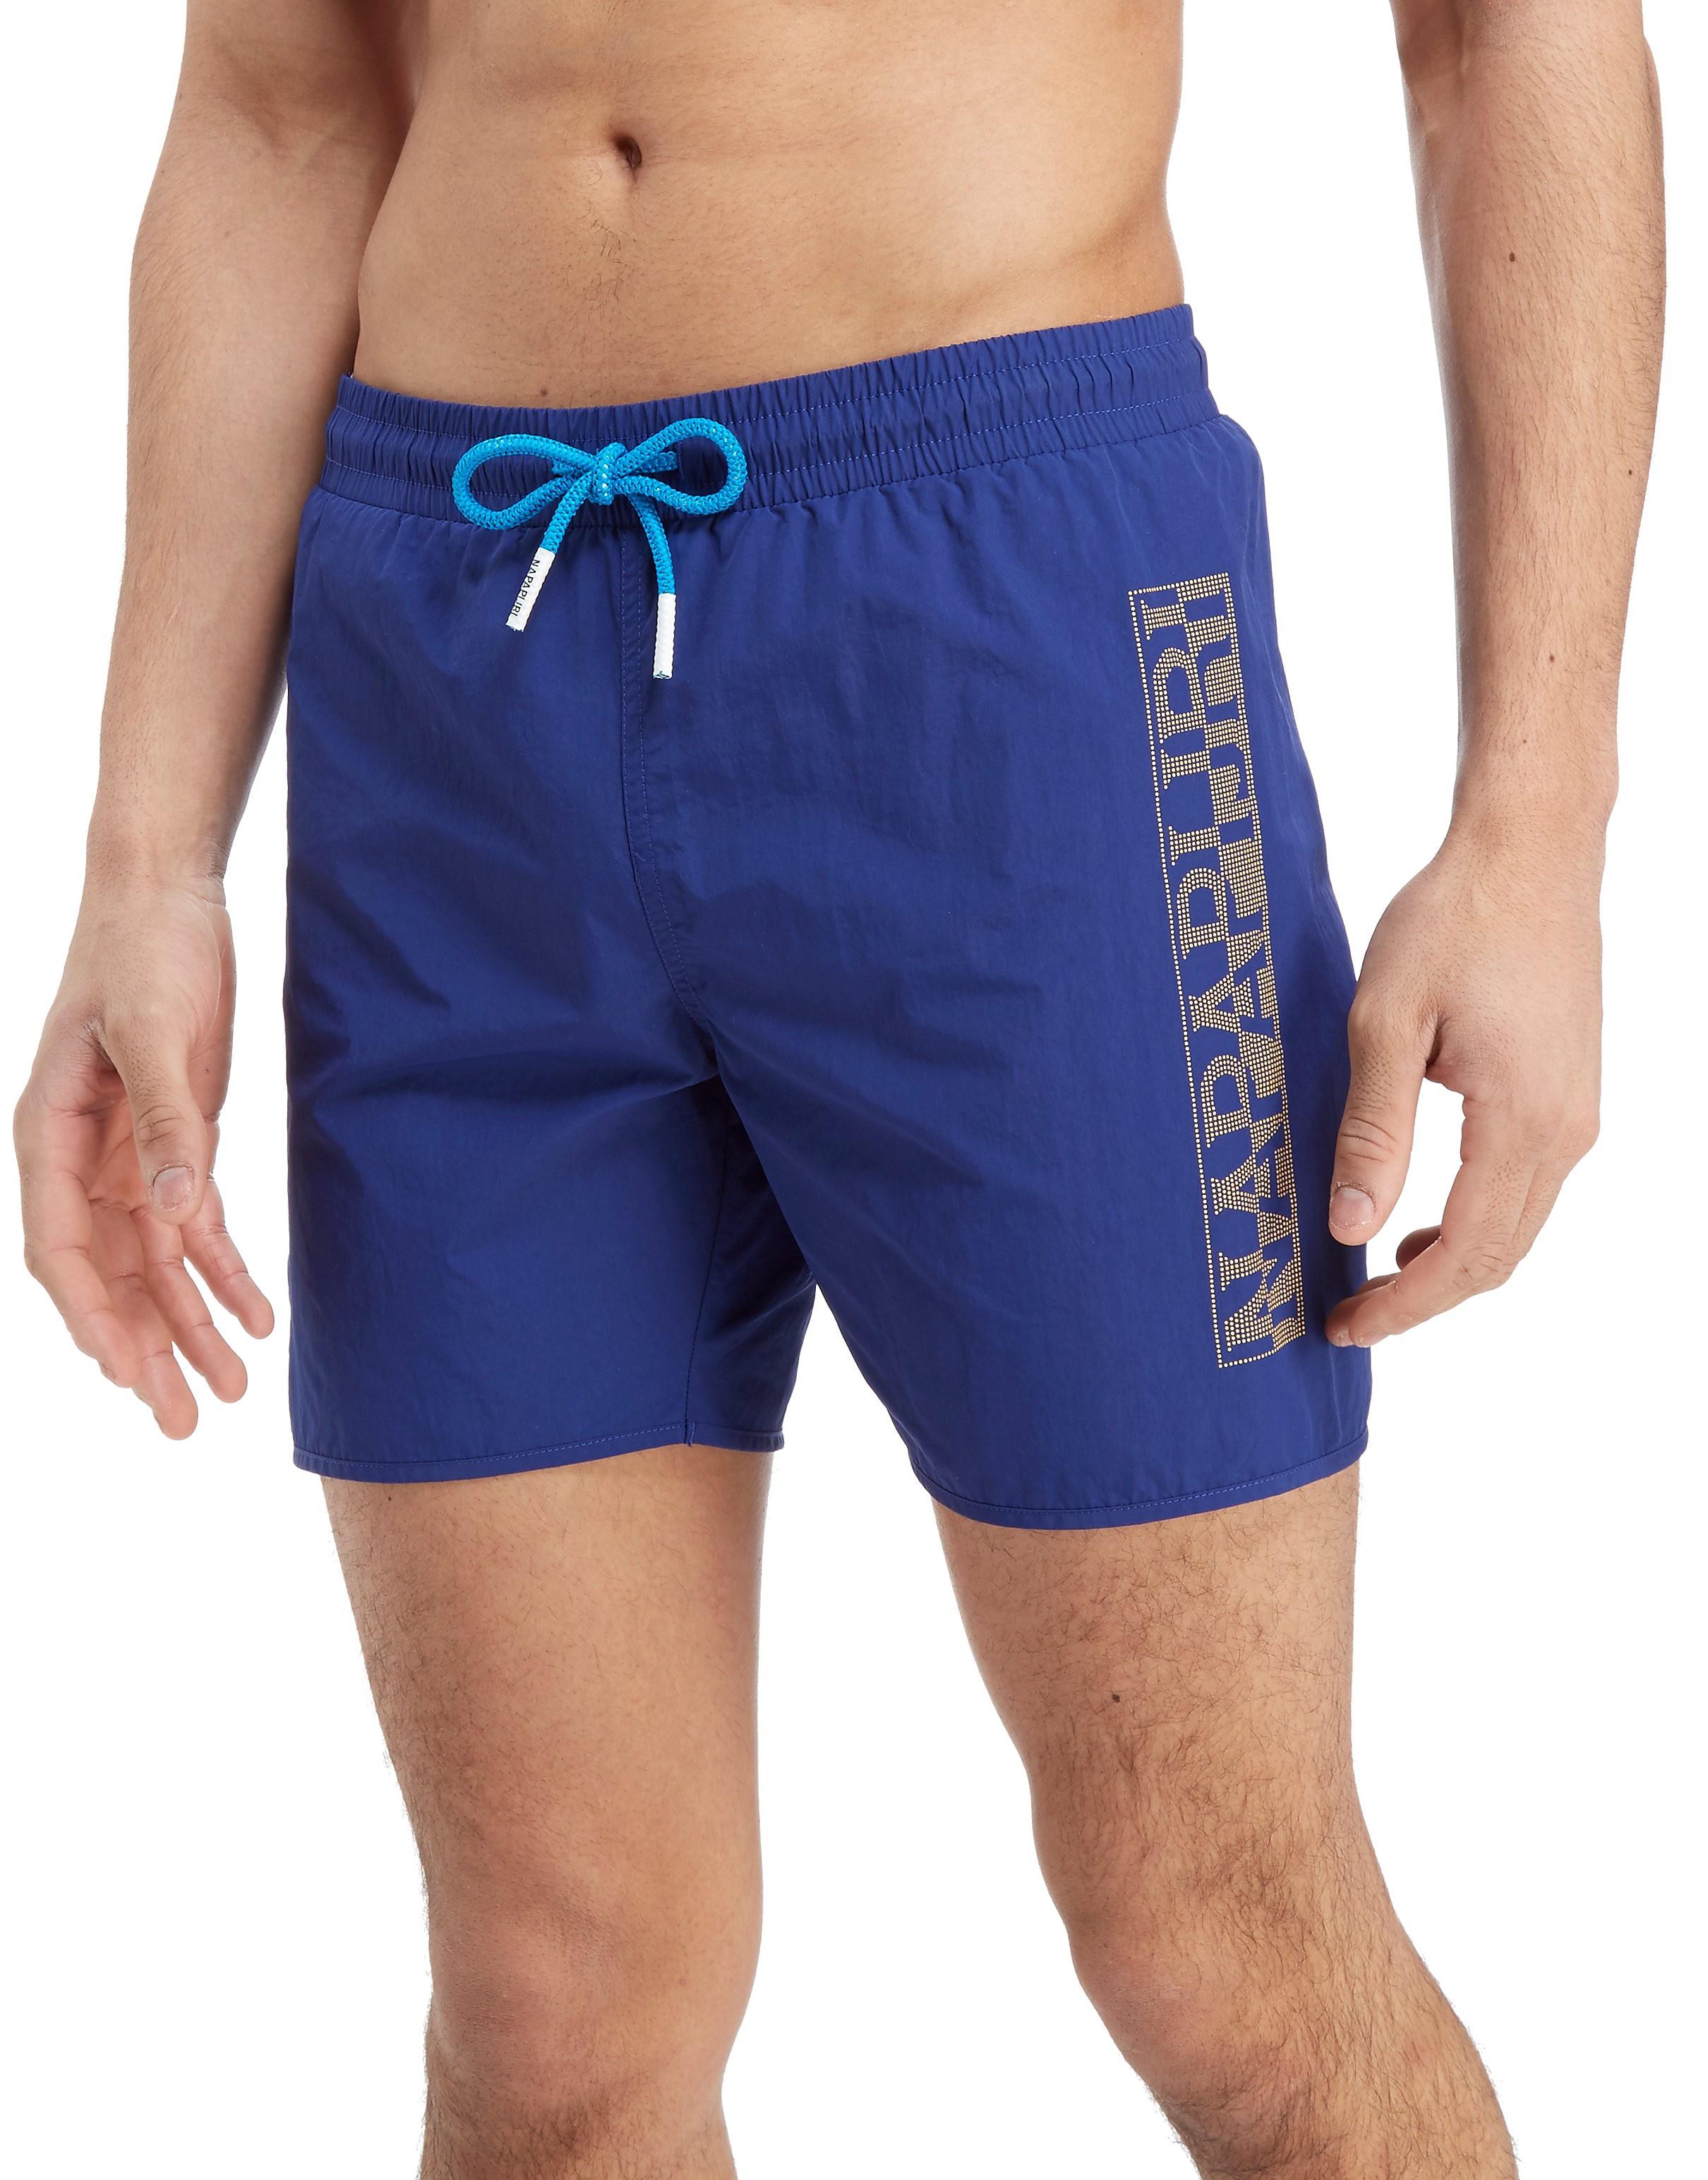 Napapijri Short de bain Side Logo Homme - Bleu, Bleu